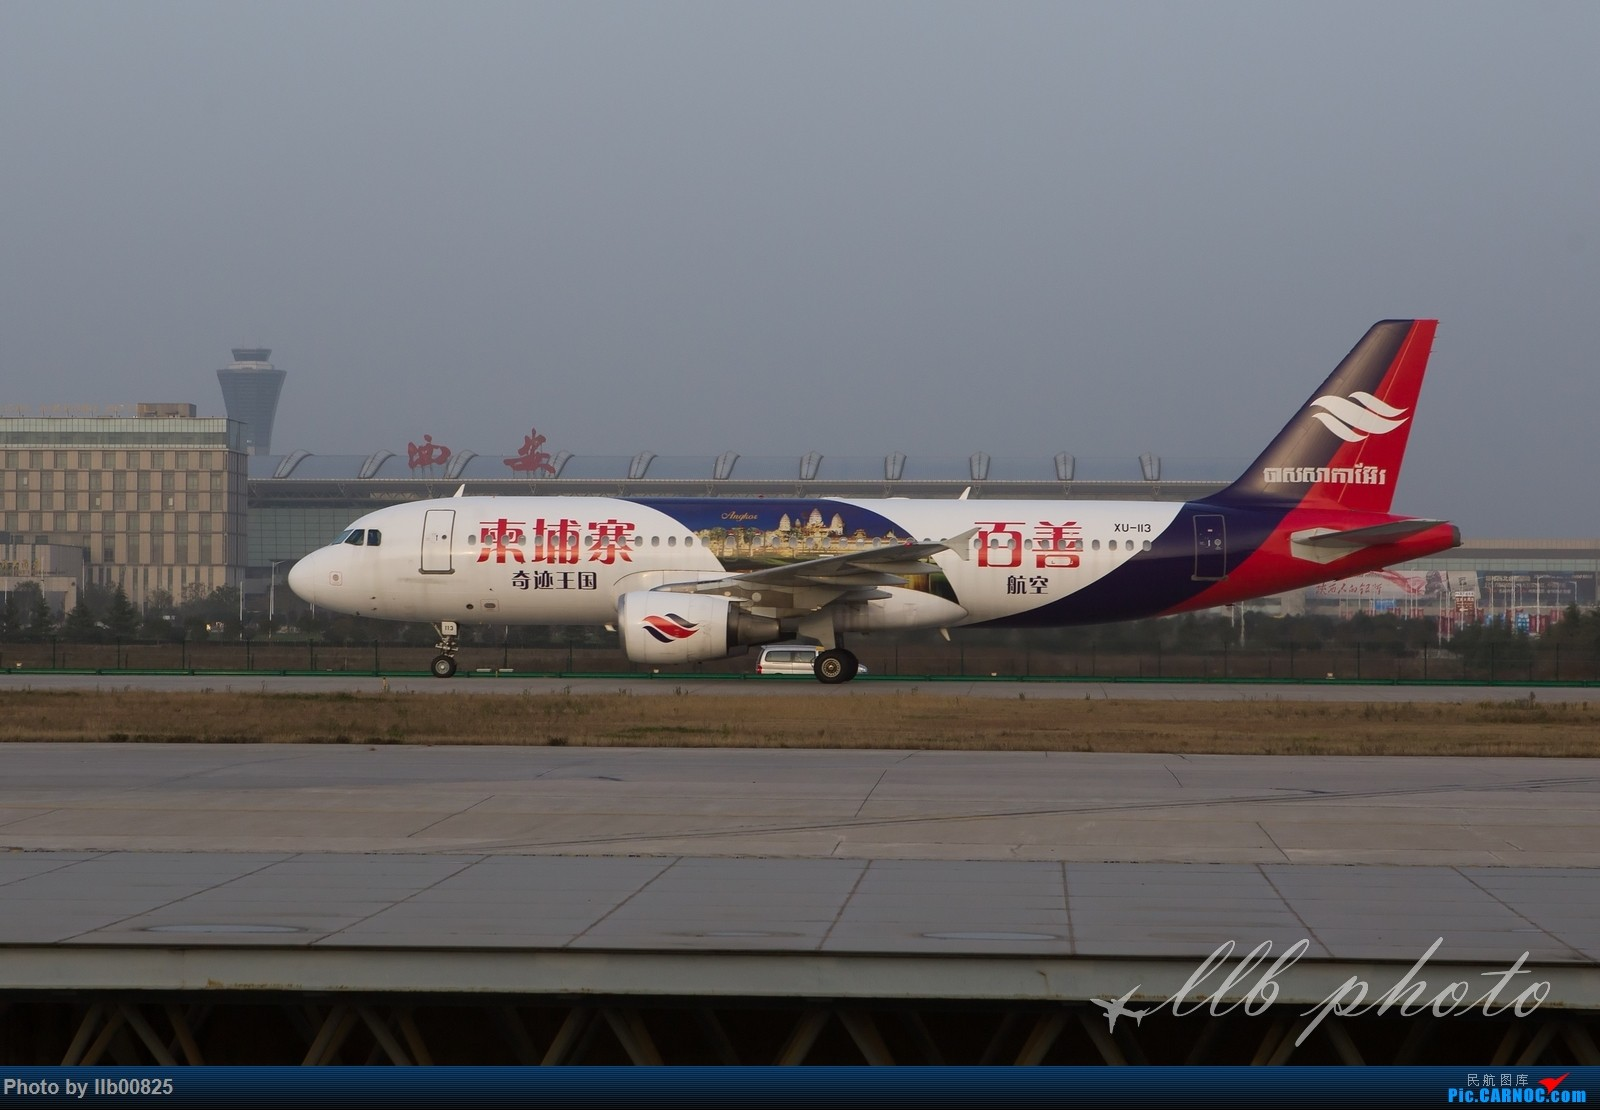 Re:[原创]XIY—延误有延误的好处嘛~~晚上的东西全到白天了~ AIRBUS A320 XU-113 中国西安咸阳国际机场